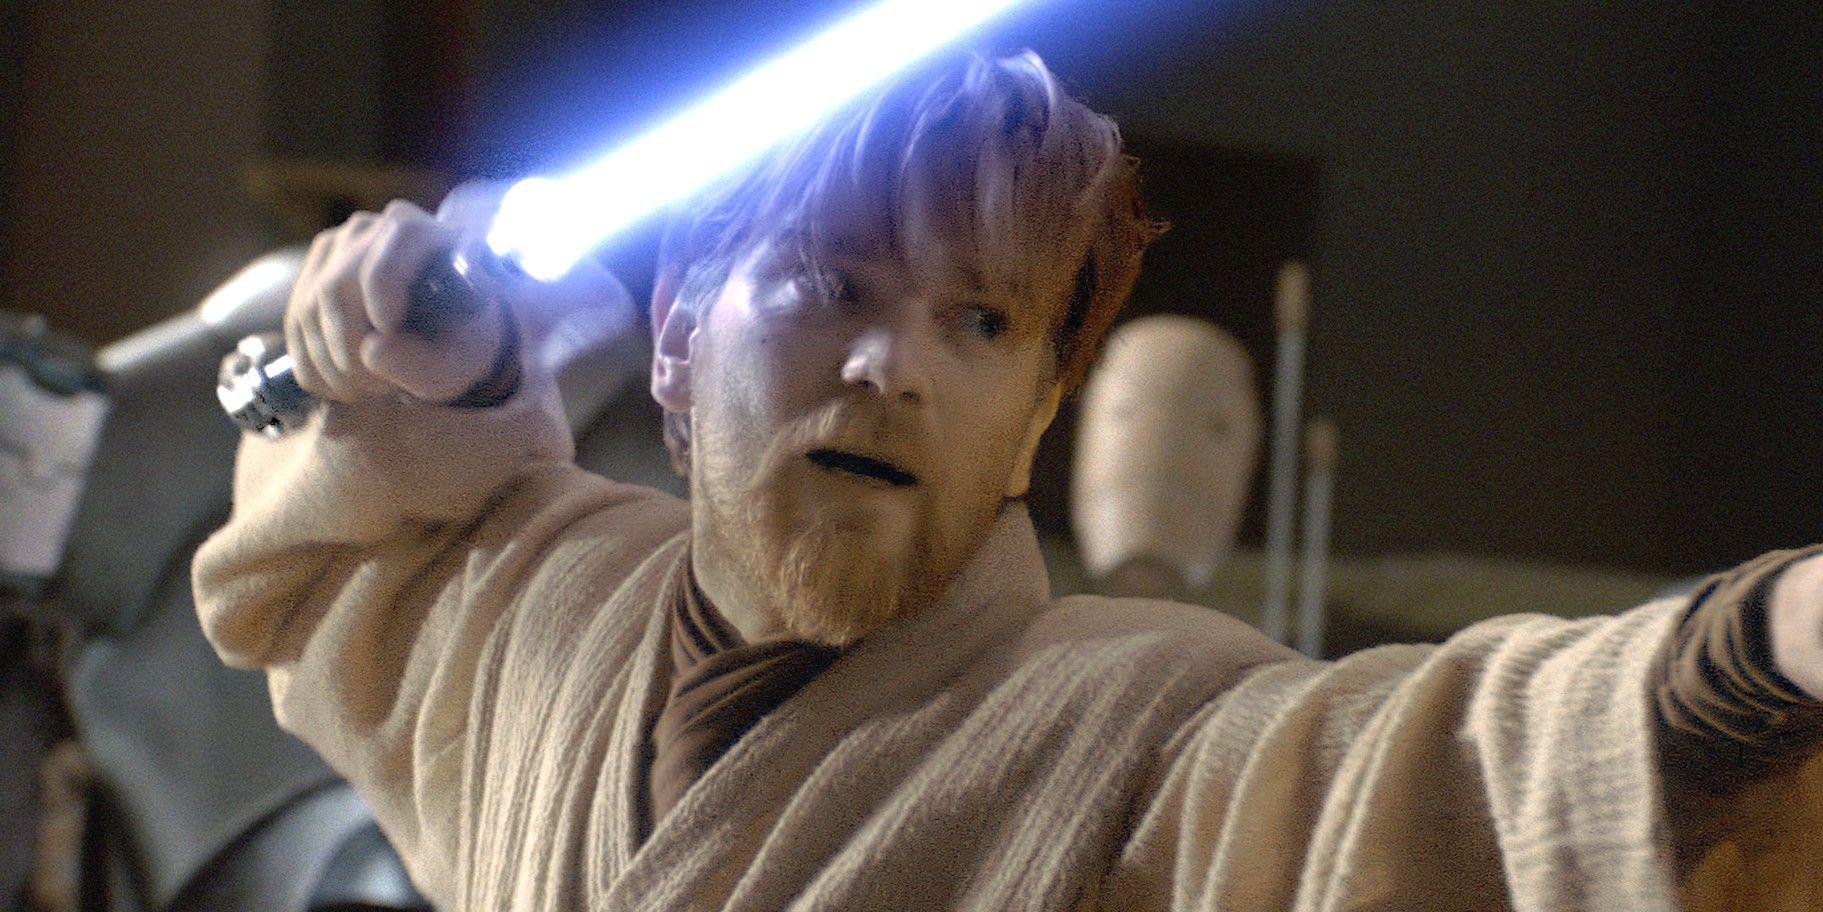 Obi-Wan Kenobi: Where the Series Falls in the Star Wars Timeline (& What Else Was Happening)